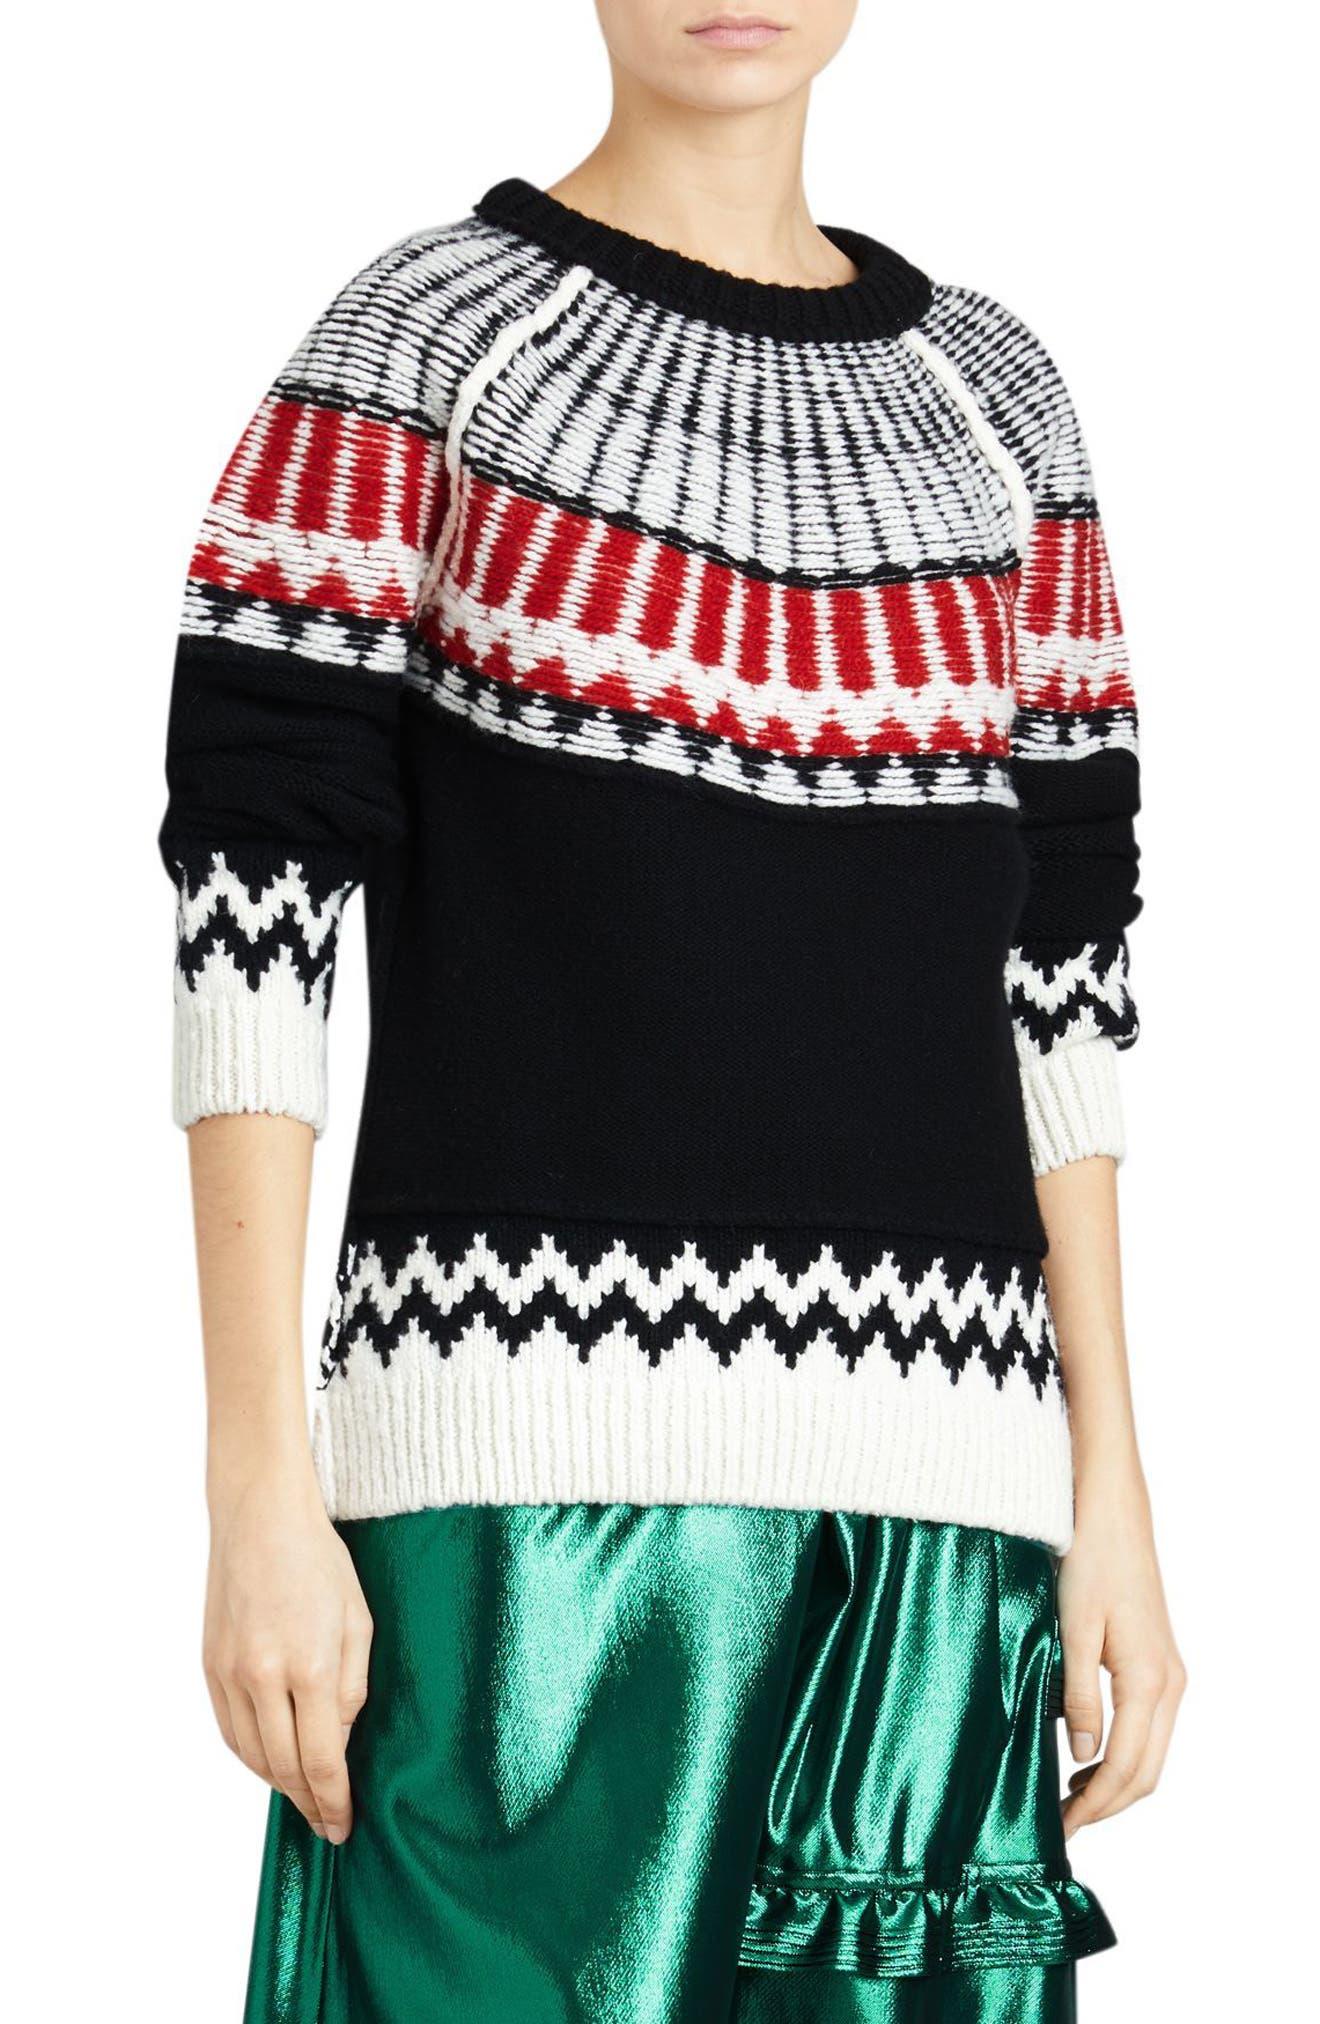 Trycroft Fair Isle Wool Blend Sweater,                             Main thumbnail 1, color,                             001